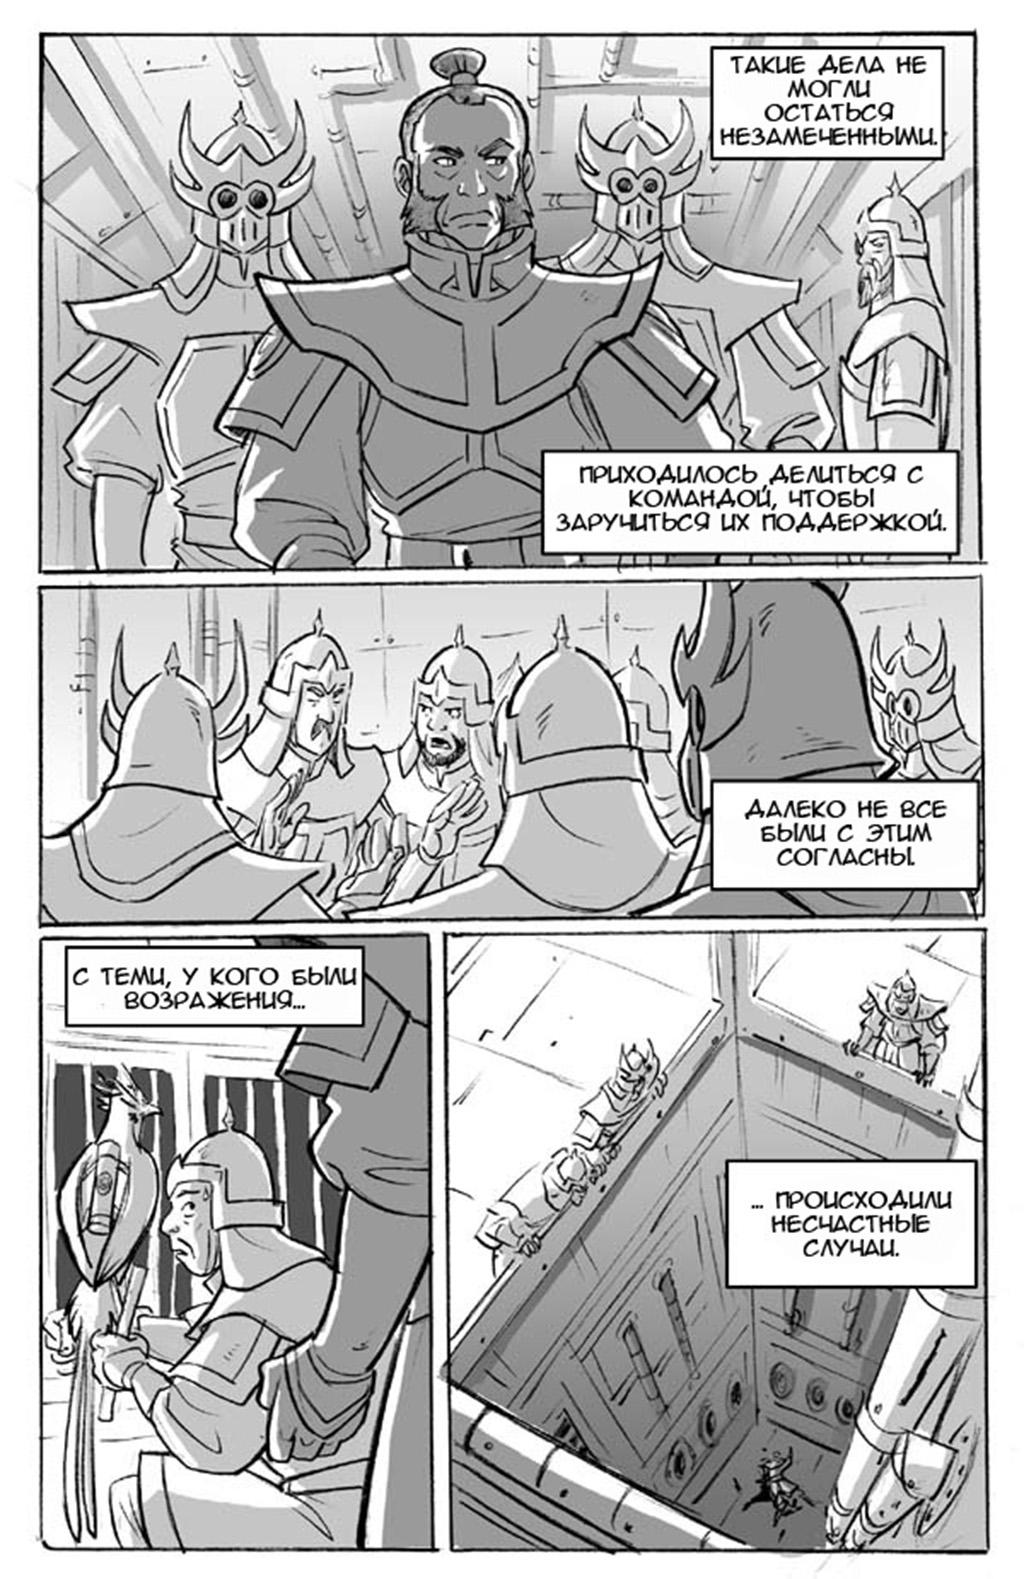 Комикс Племя Воды